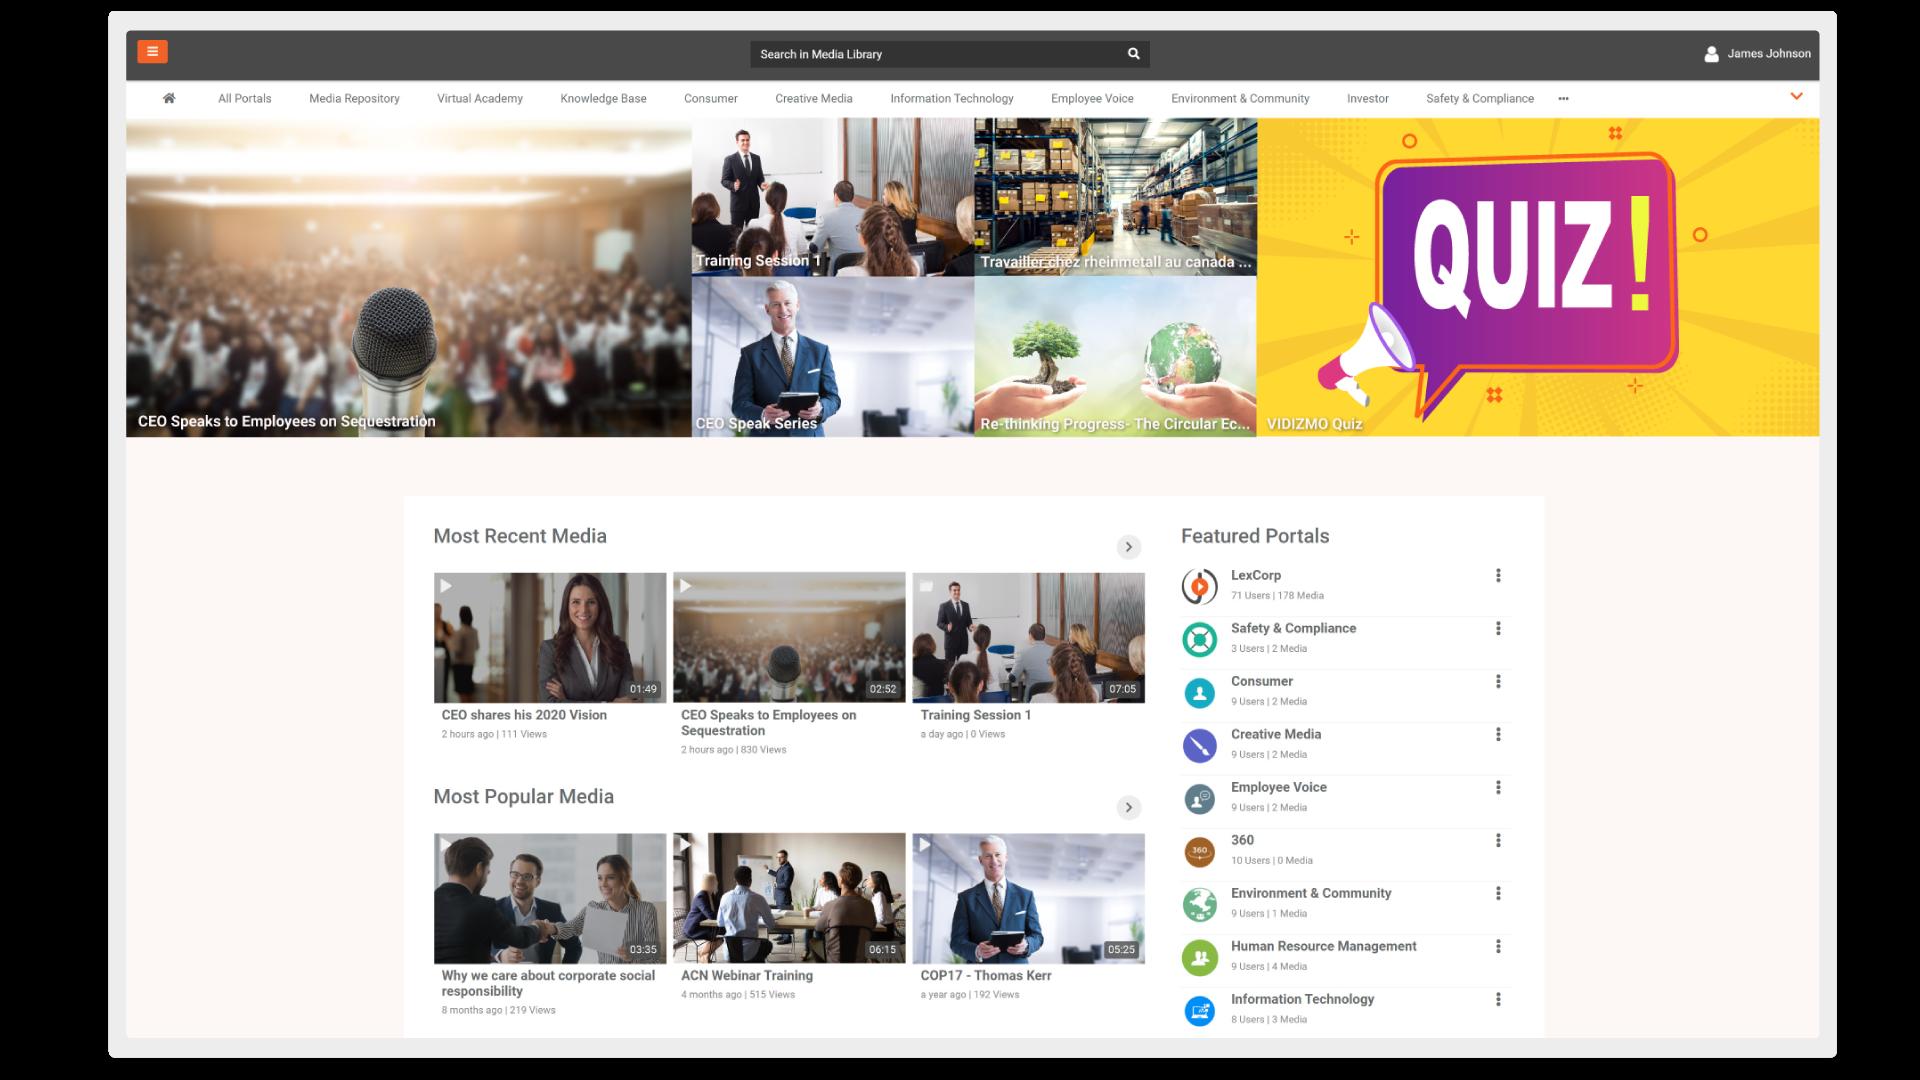 A Screenshot of VIDIZMO EnterpriseTube